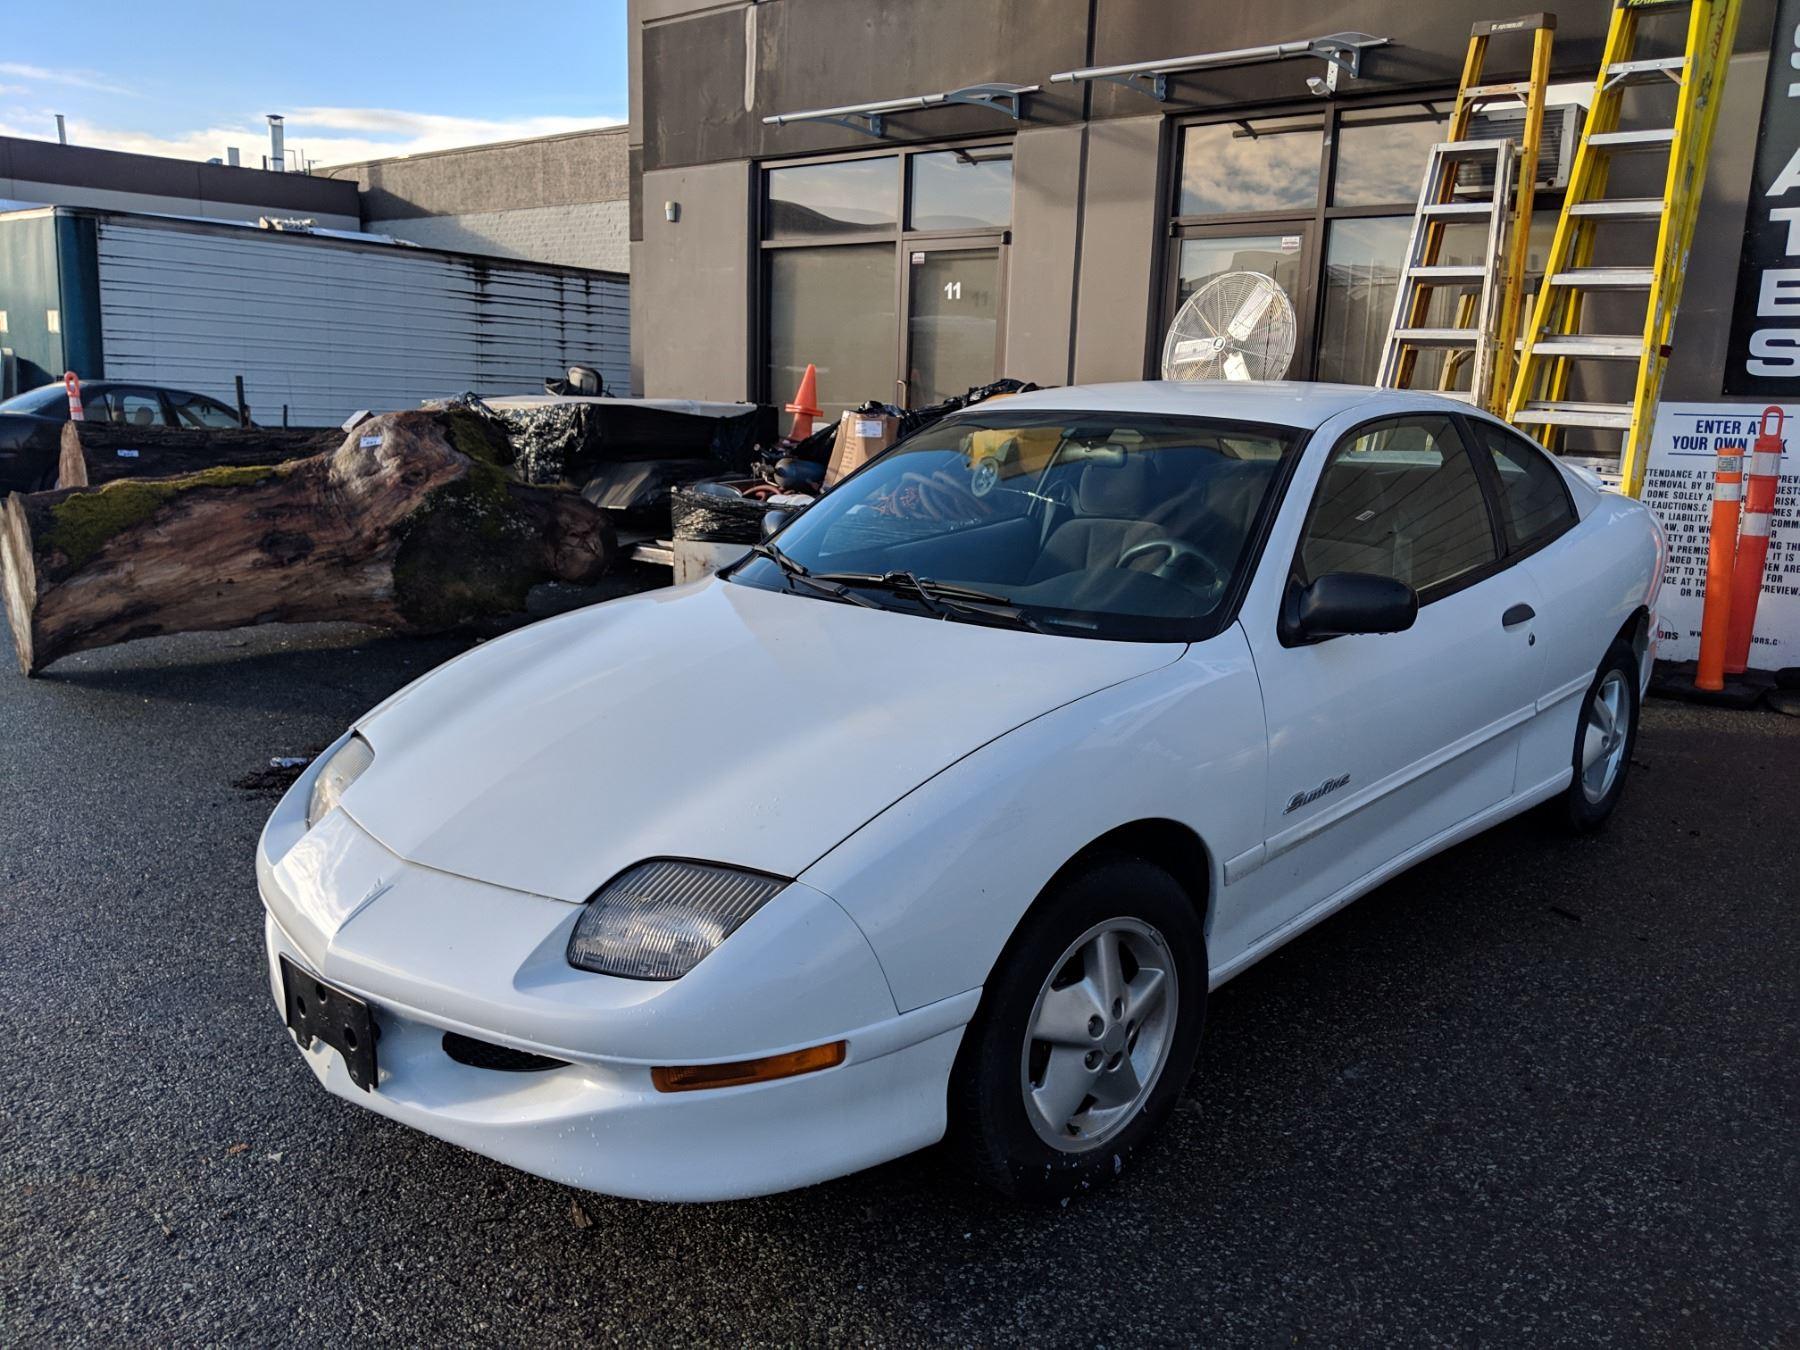 1999 pontiac sunfire white 2drcp gas automatic vin 1g2jb1249x7545950 206 513kms 1999 pontiac sunfire white 2drcp gas